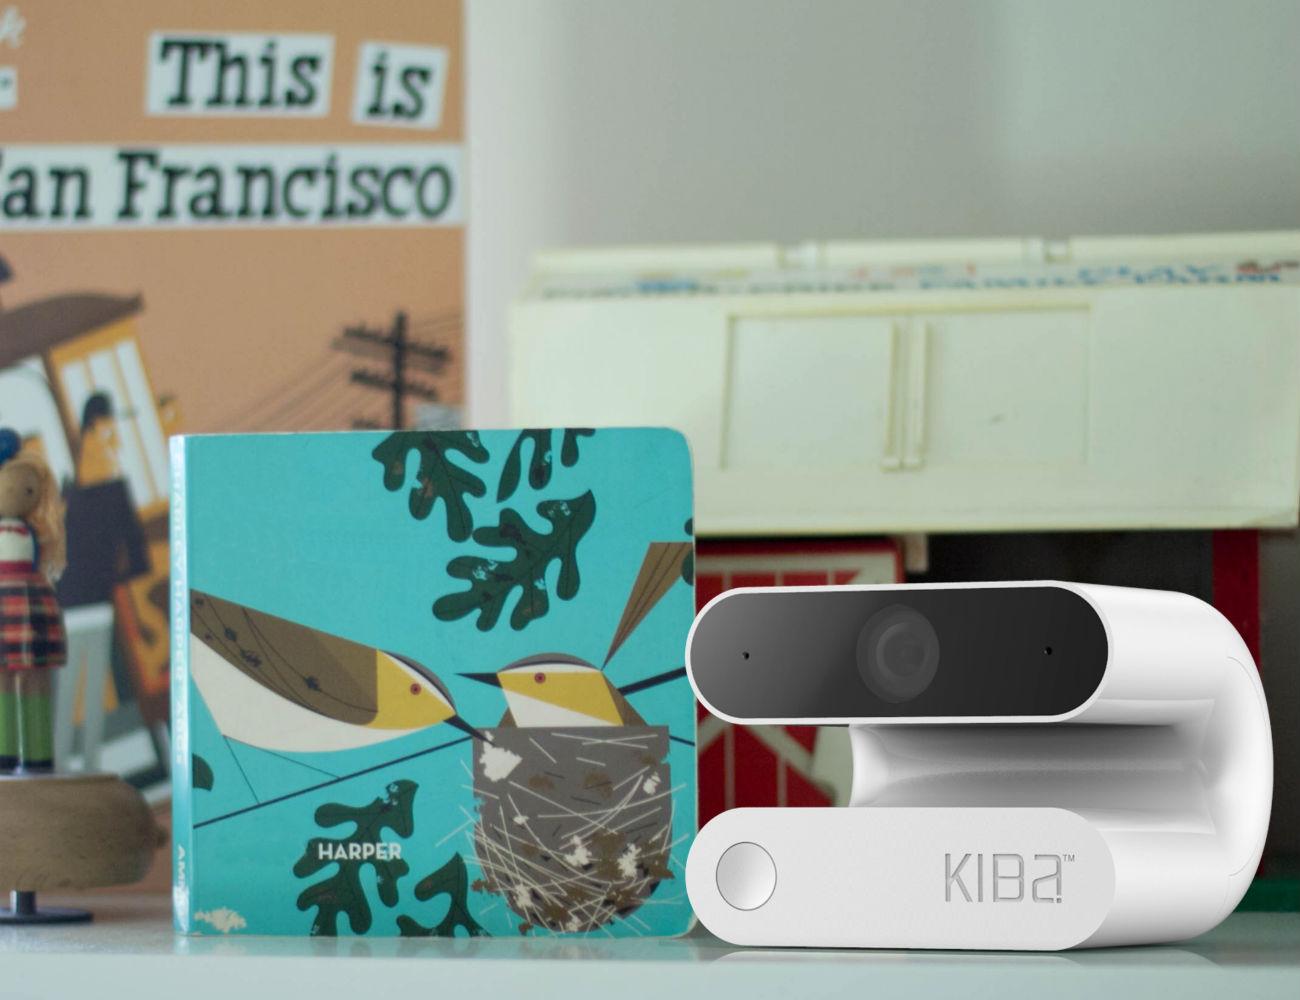 Kiba – The World's First Interactive Self-Editing Camera